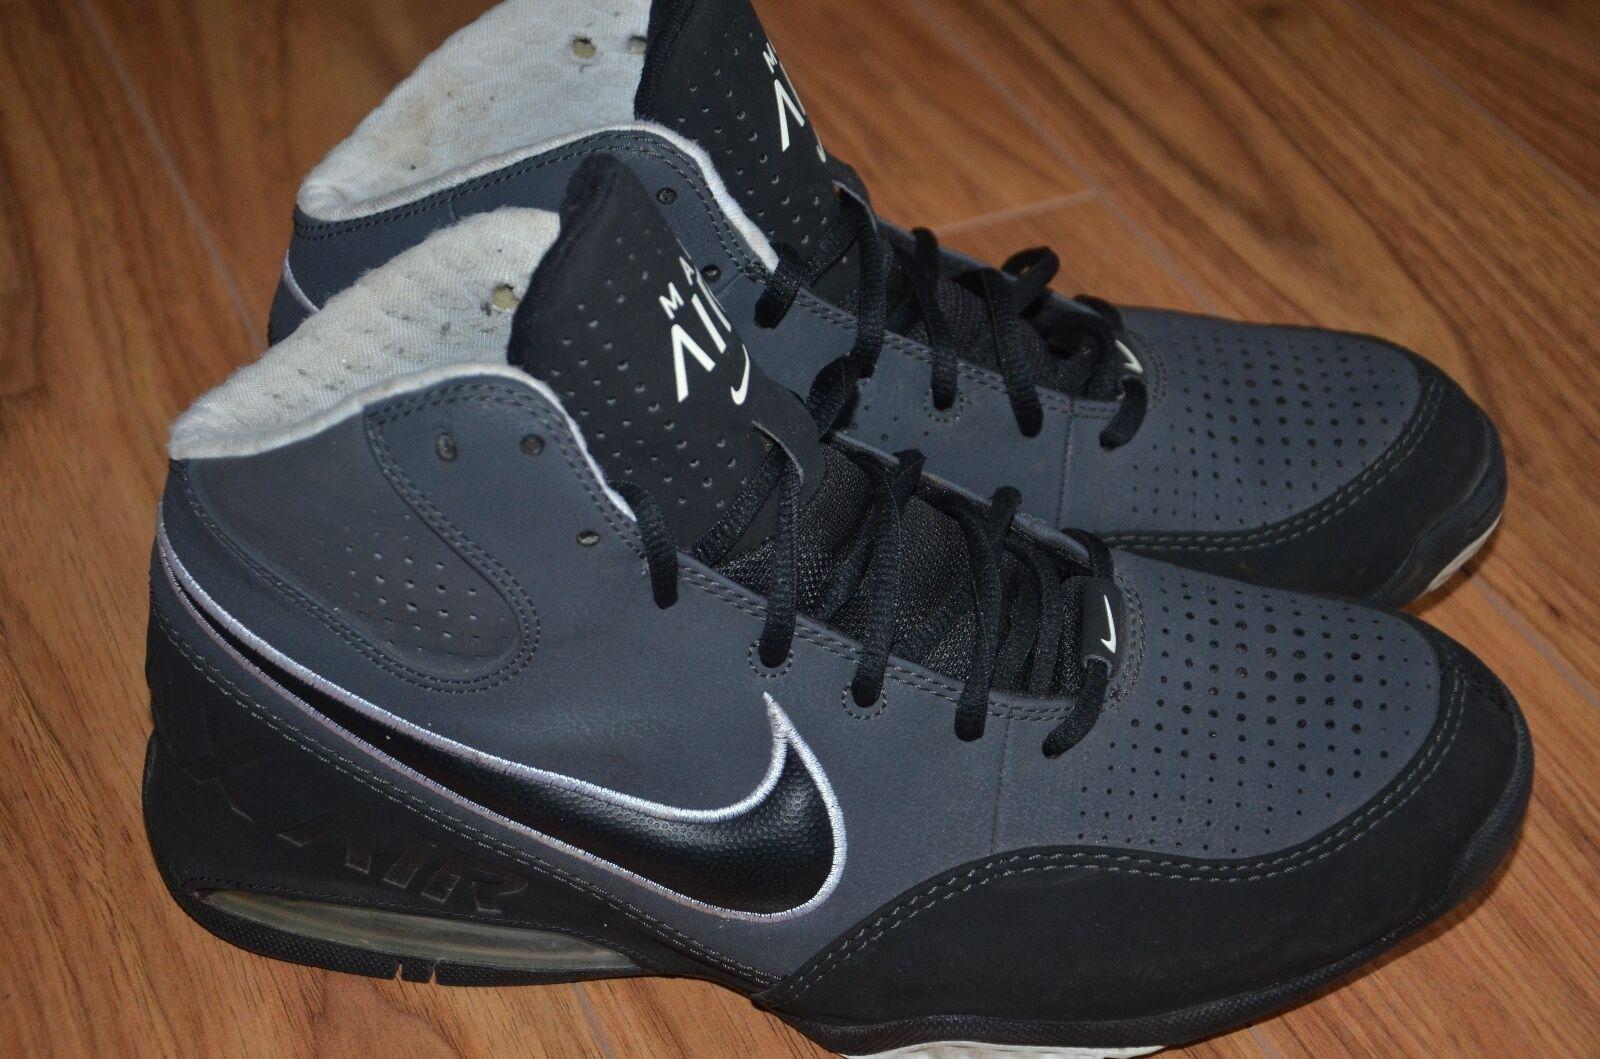 Nike Max air mens shoes athletic size 9.5 US Cheap women's shoes women's shoes